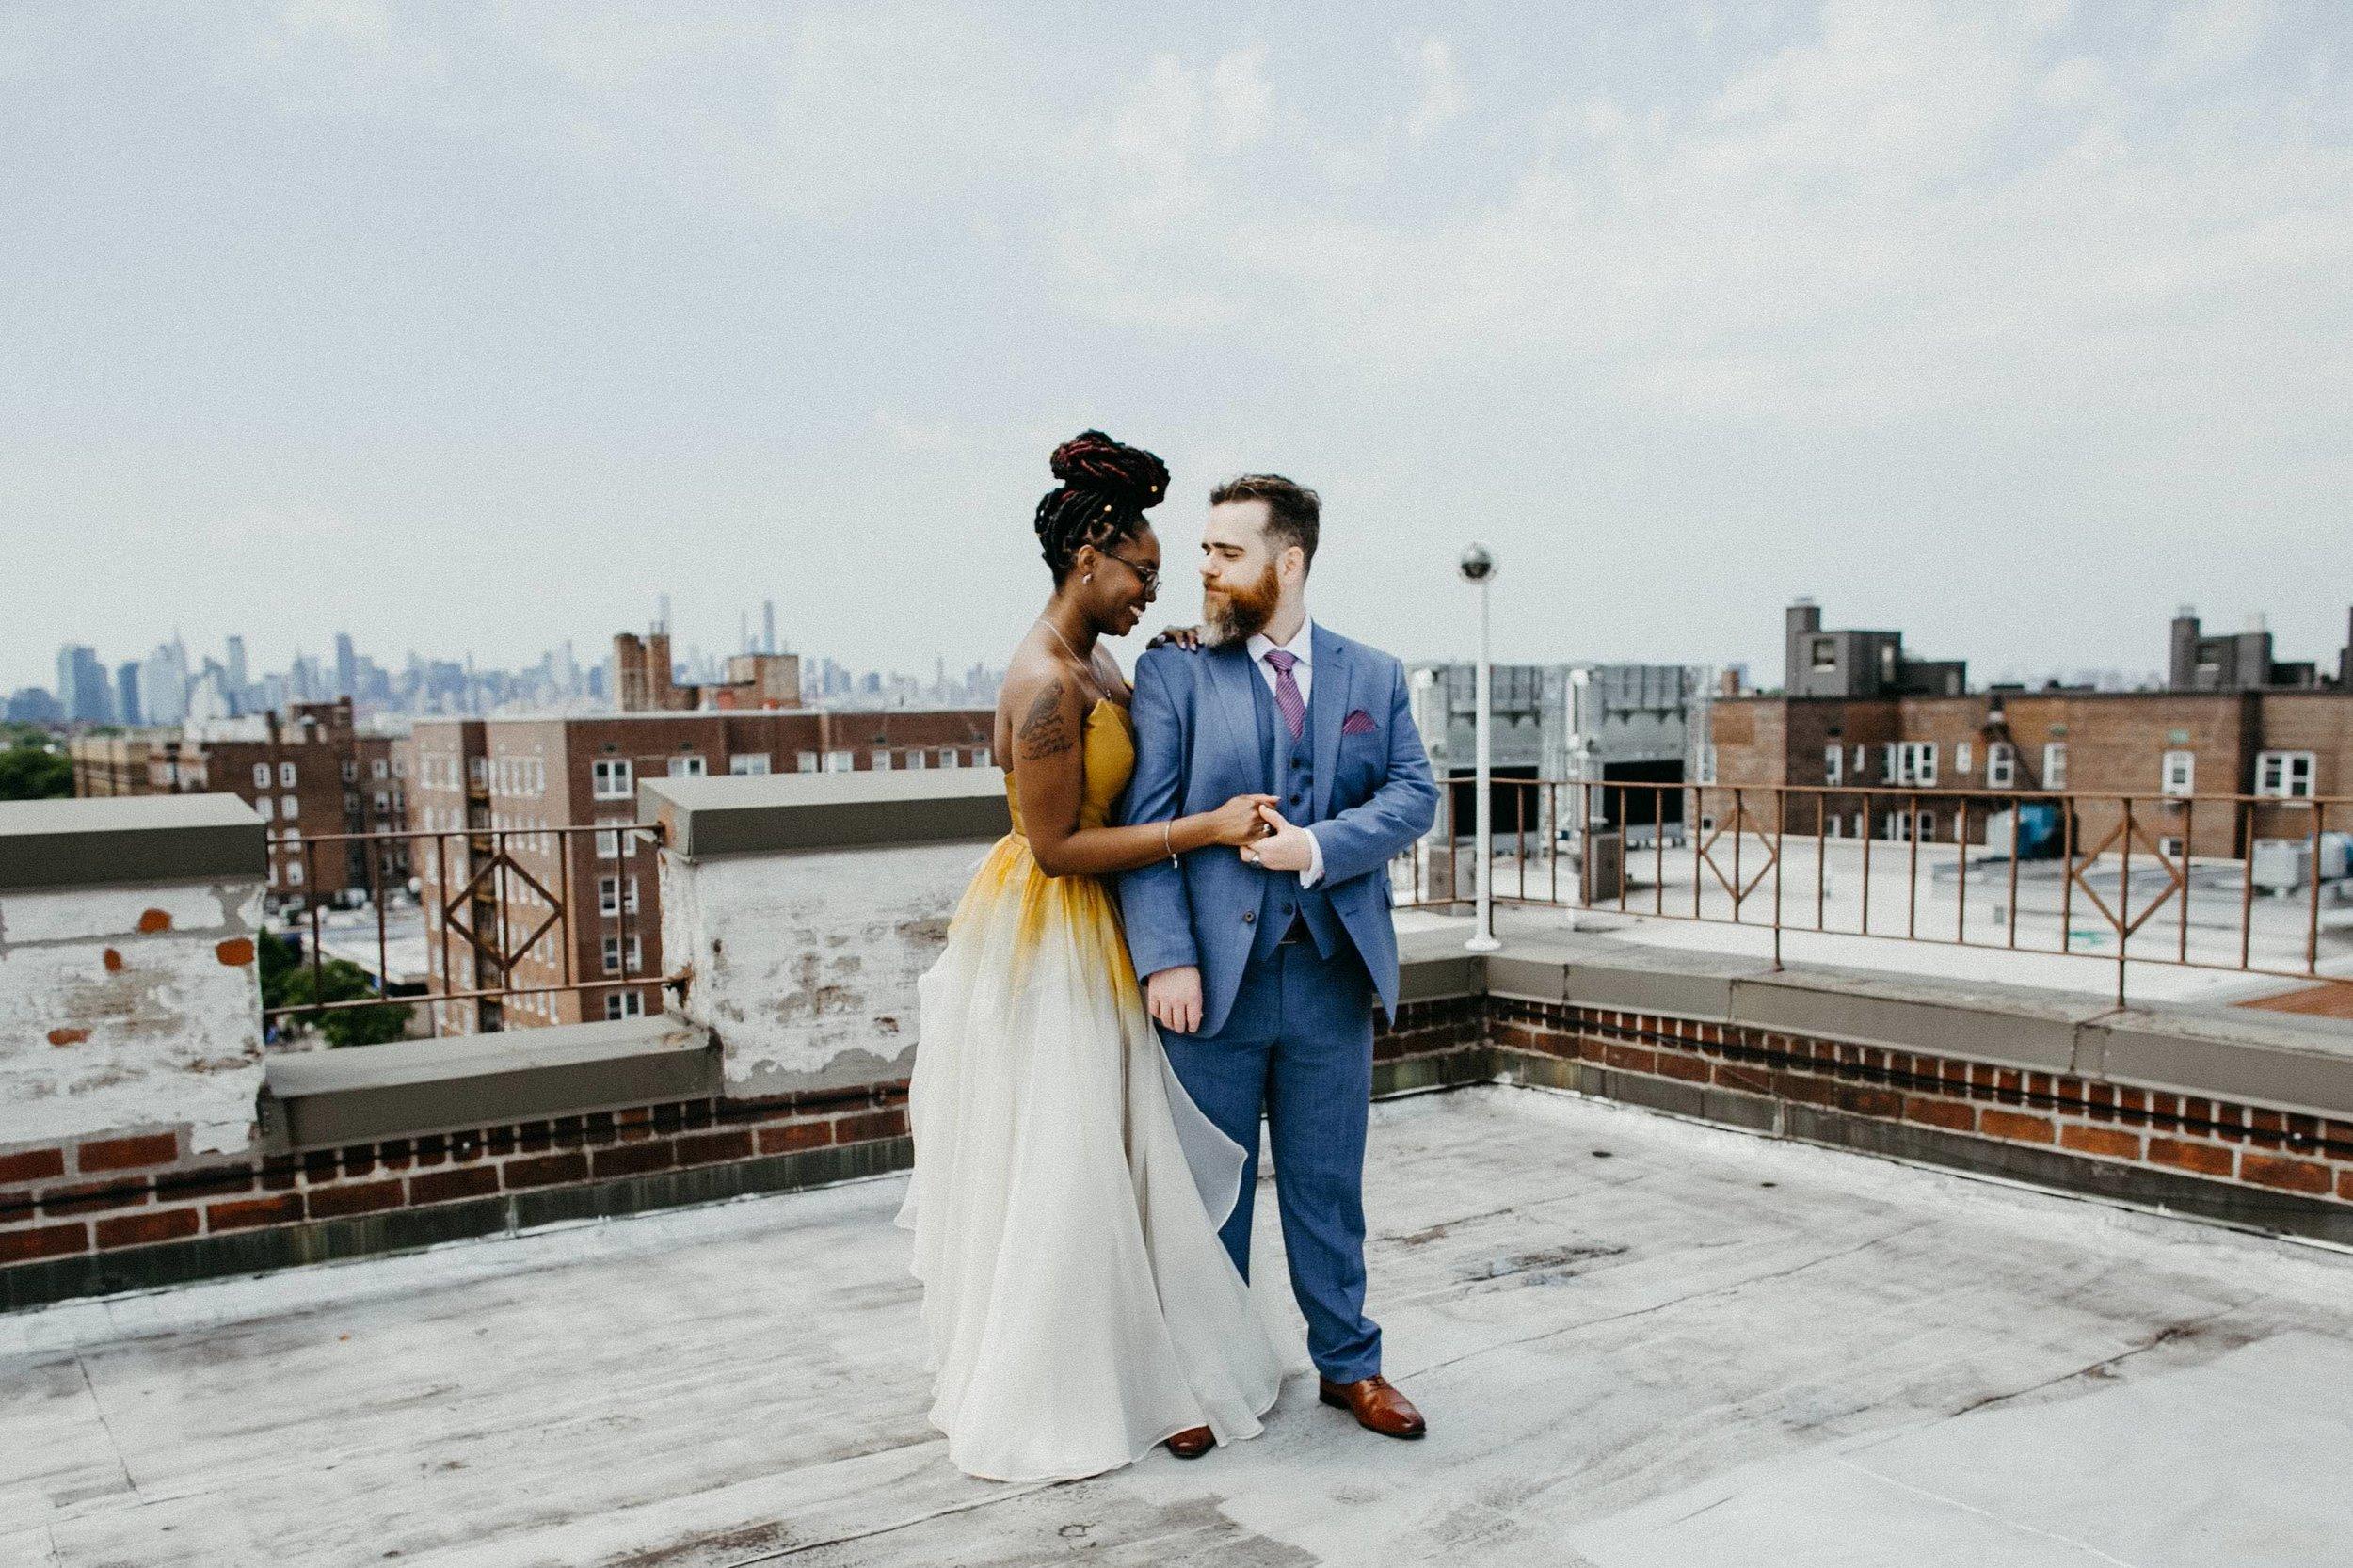 Sevlynn-Photography-Wedding-LIC-Landing-Maiella-NYC-7.jpg